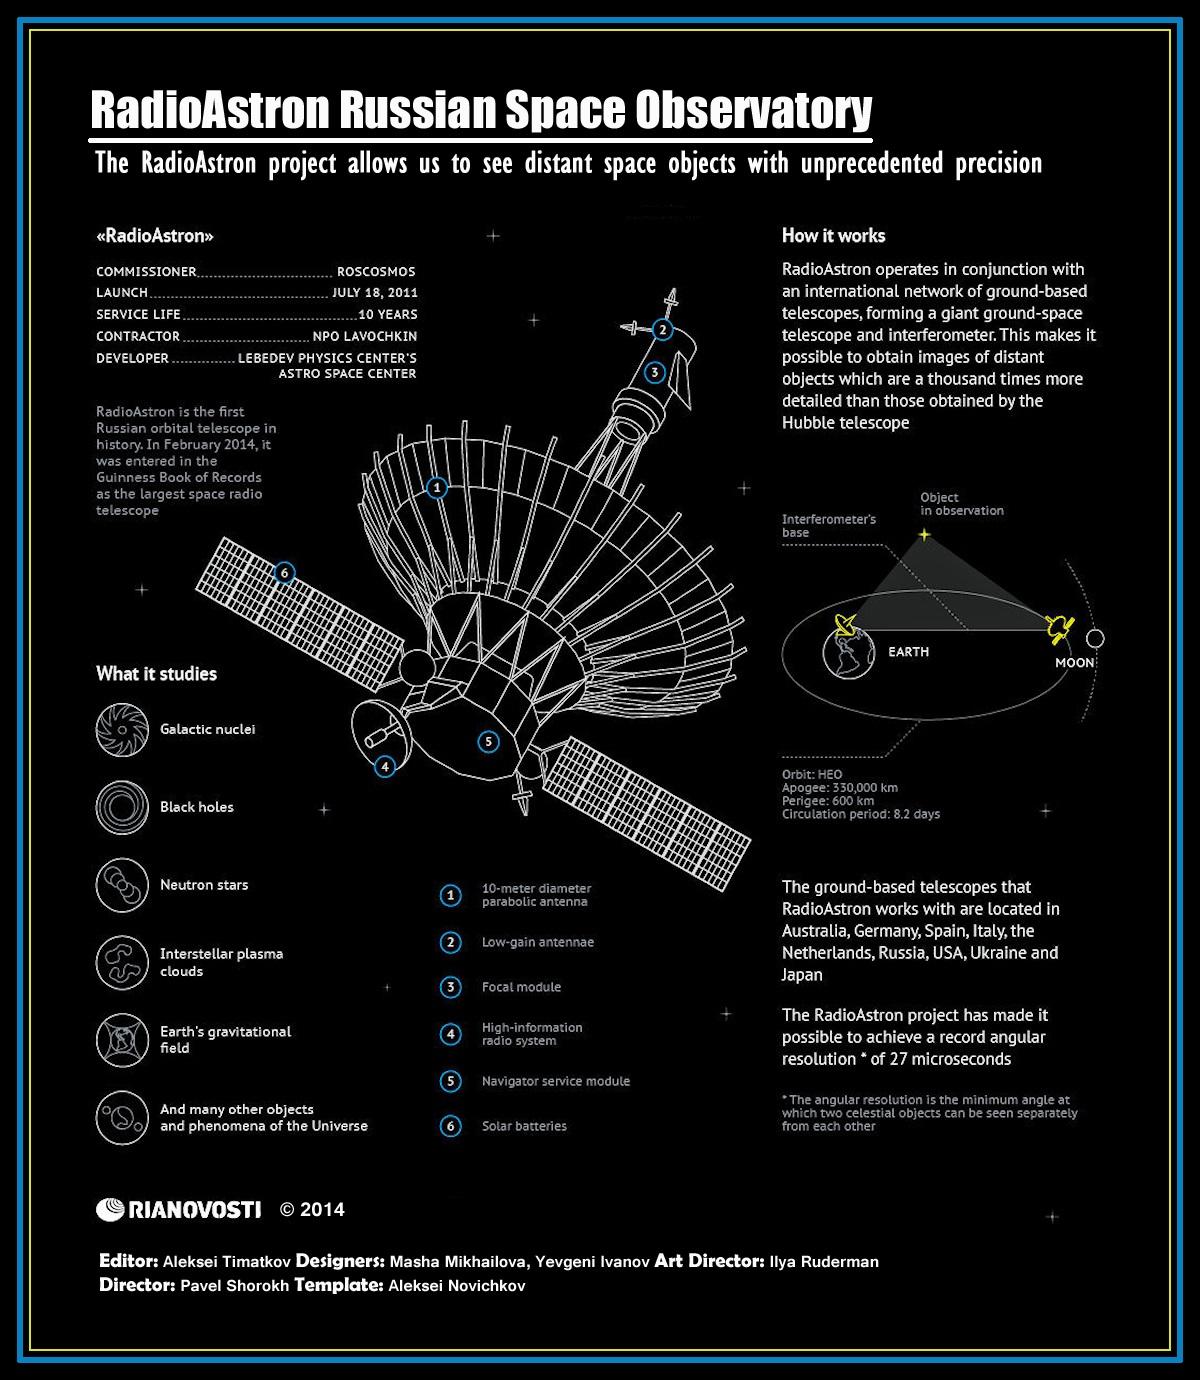 00 RIA-Novosti Infographic. RadioAstron Russian Space Observatory. 21.04.14